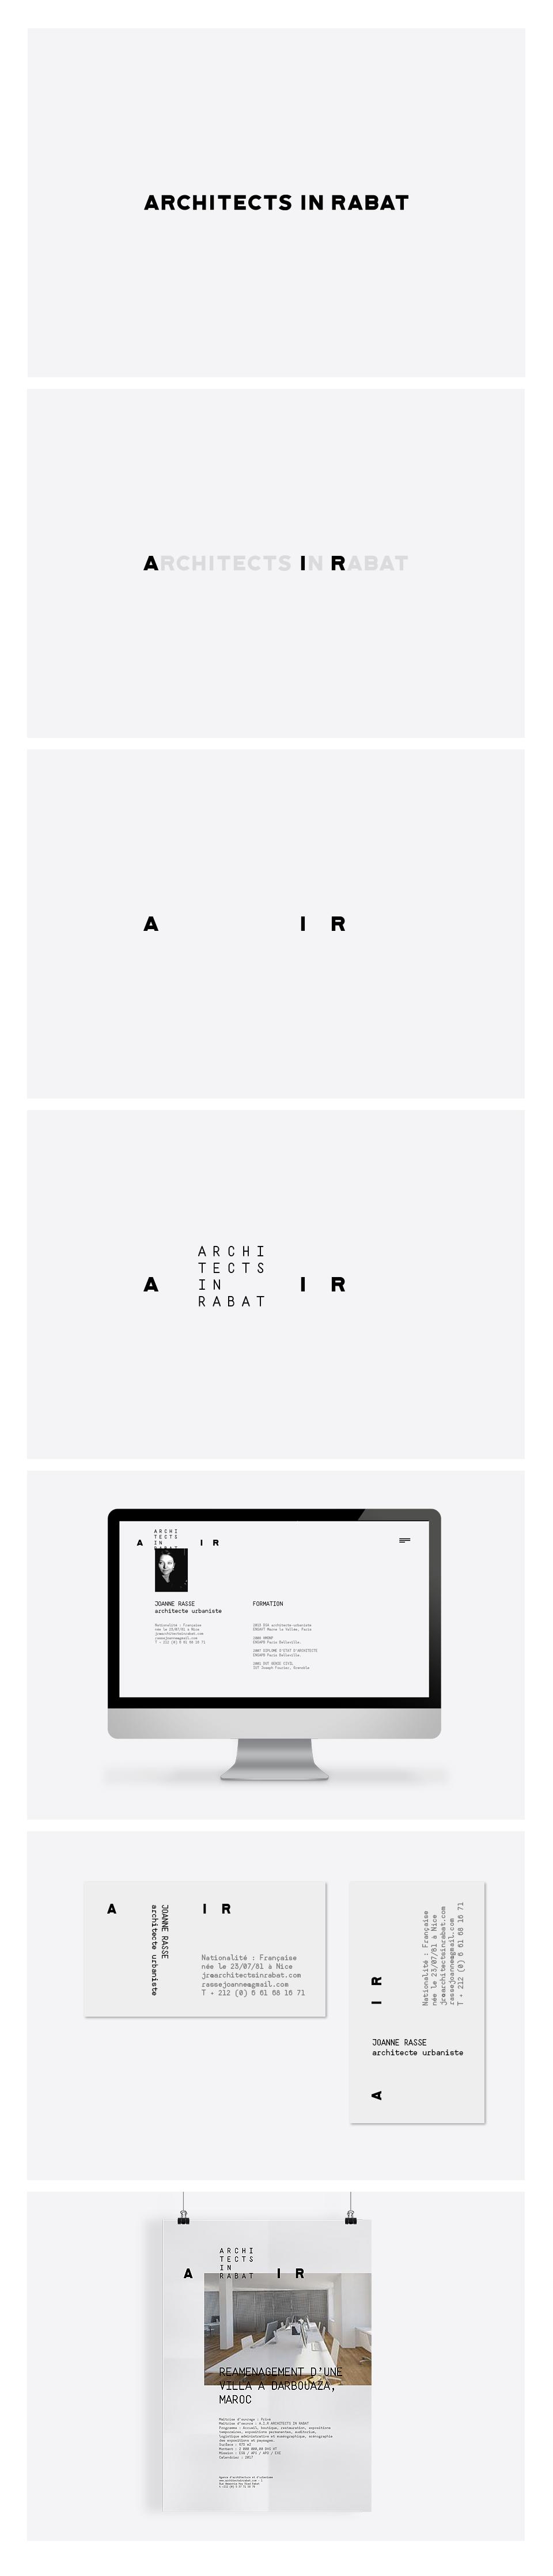 A typography focused logo design